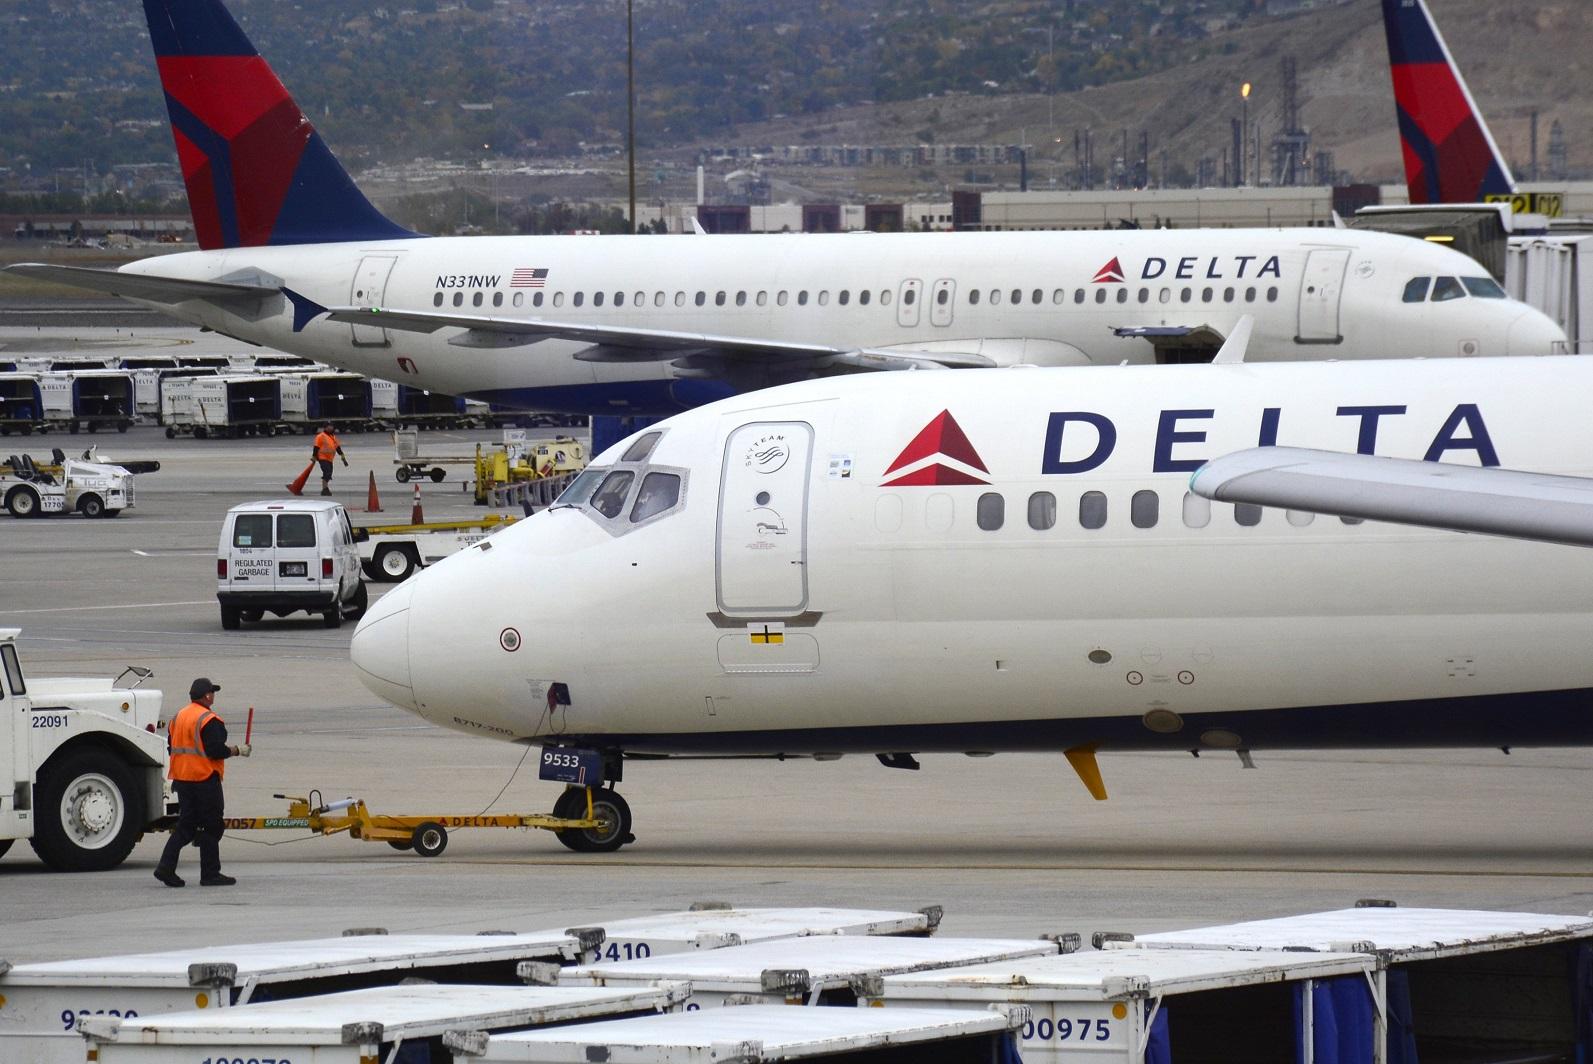 Five injured after Delta passengers evacuate plane in Nigeria